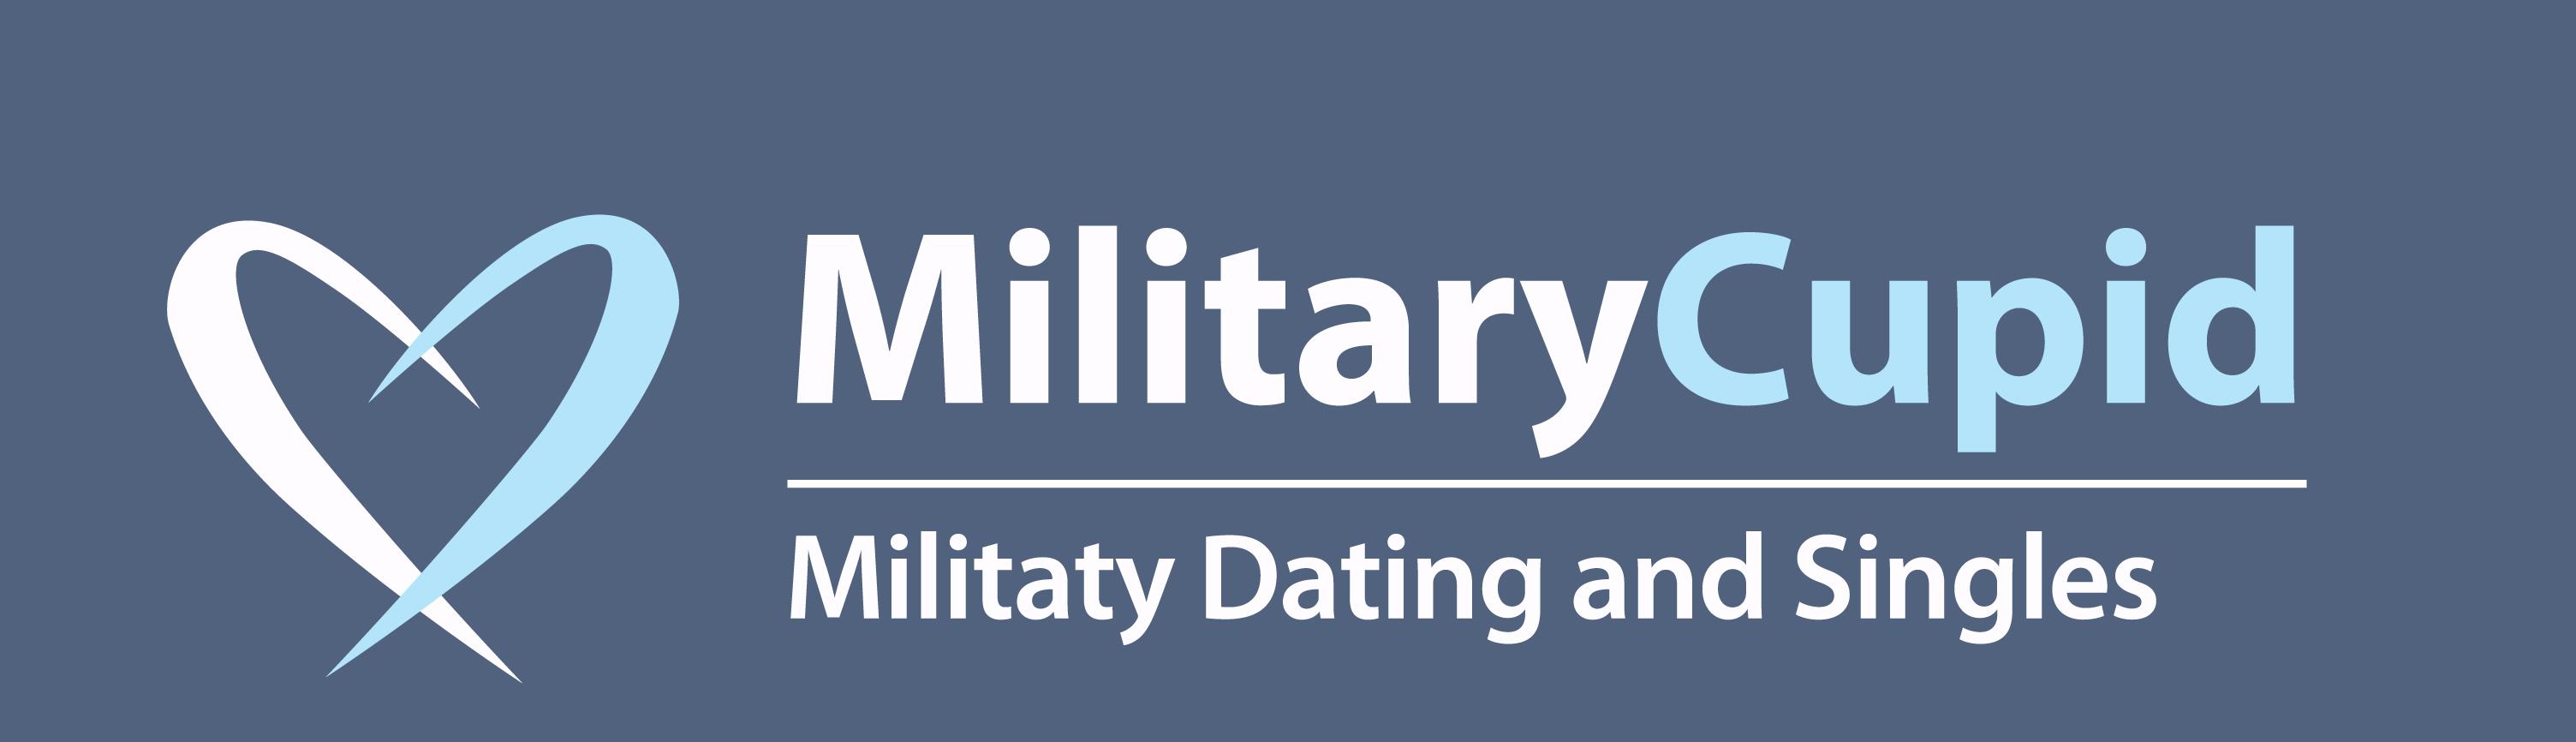 Dating profiile über 50 christliche frau